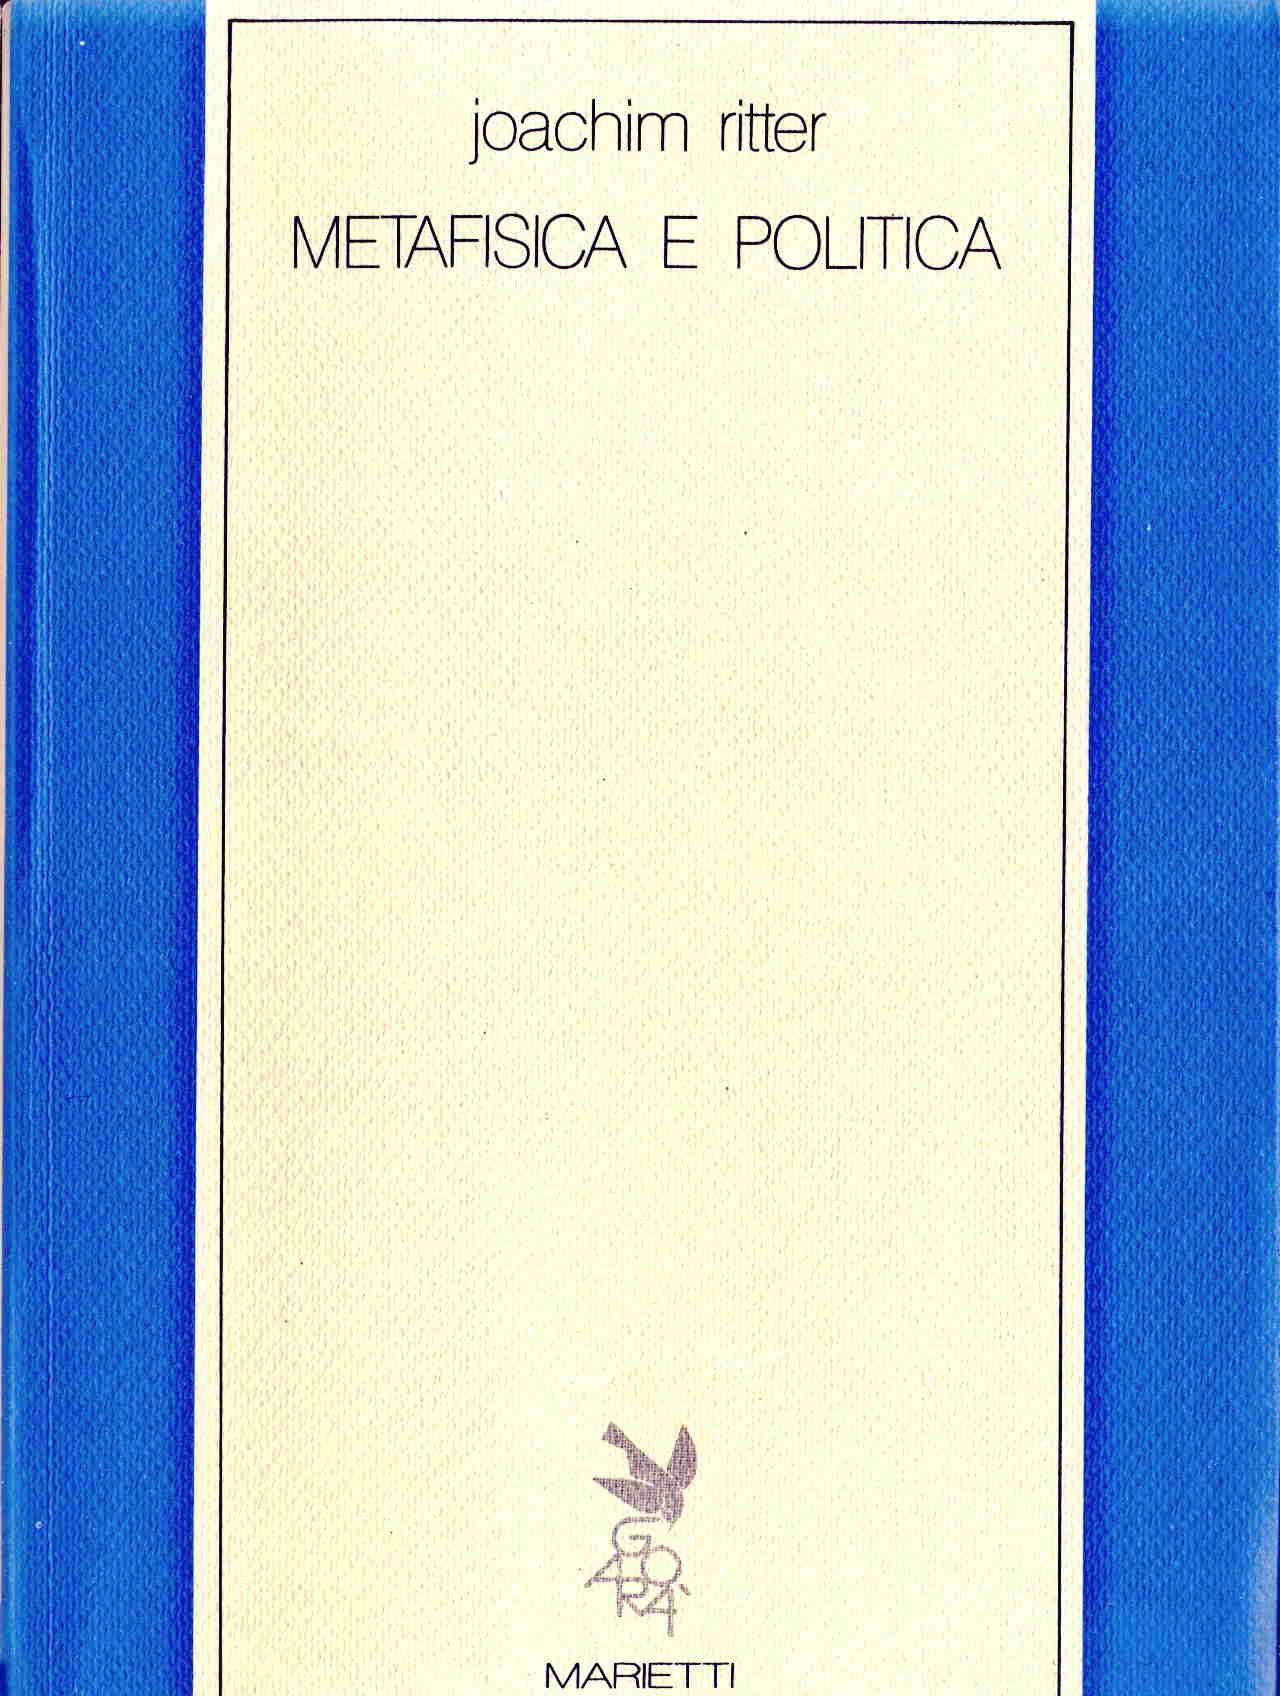 Metafisica e politica